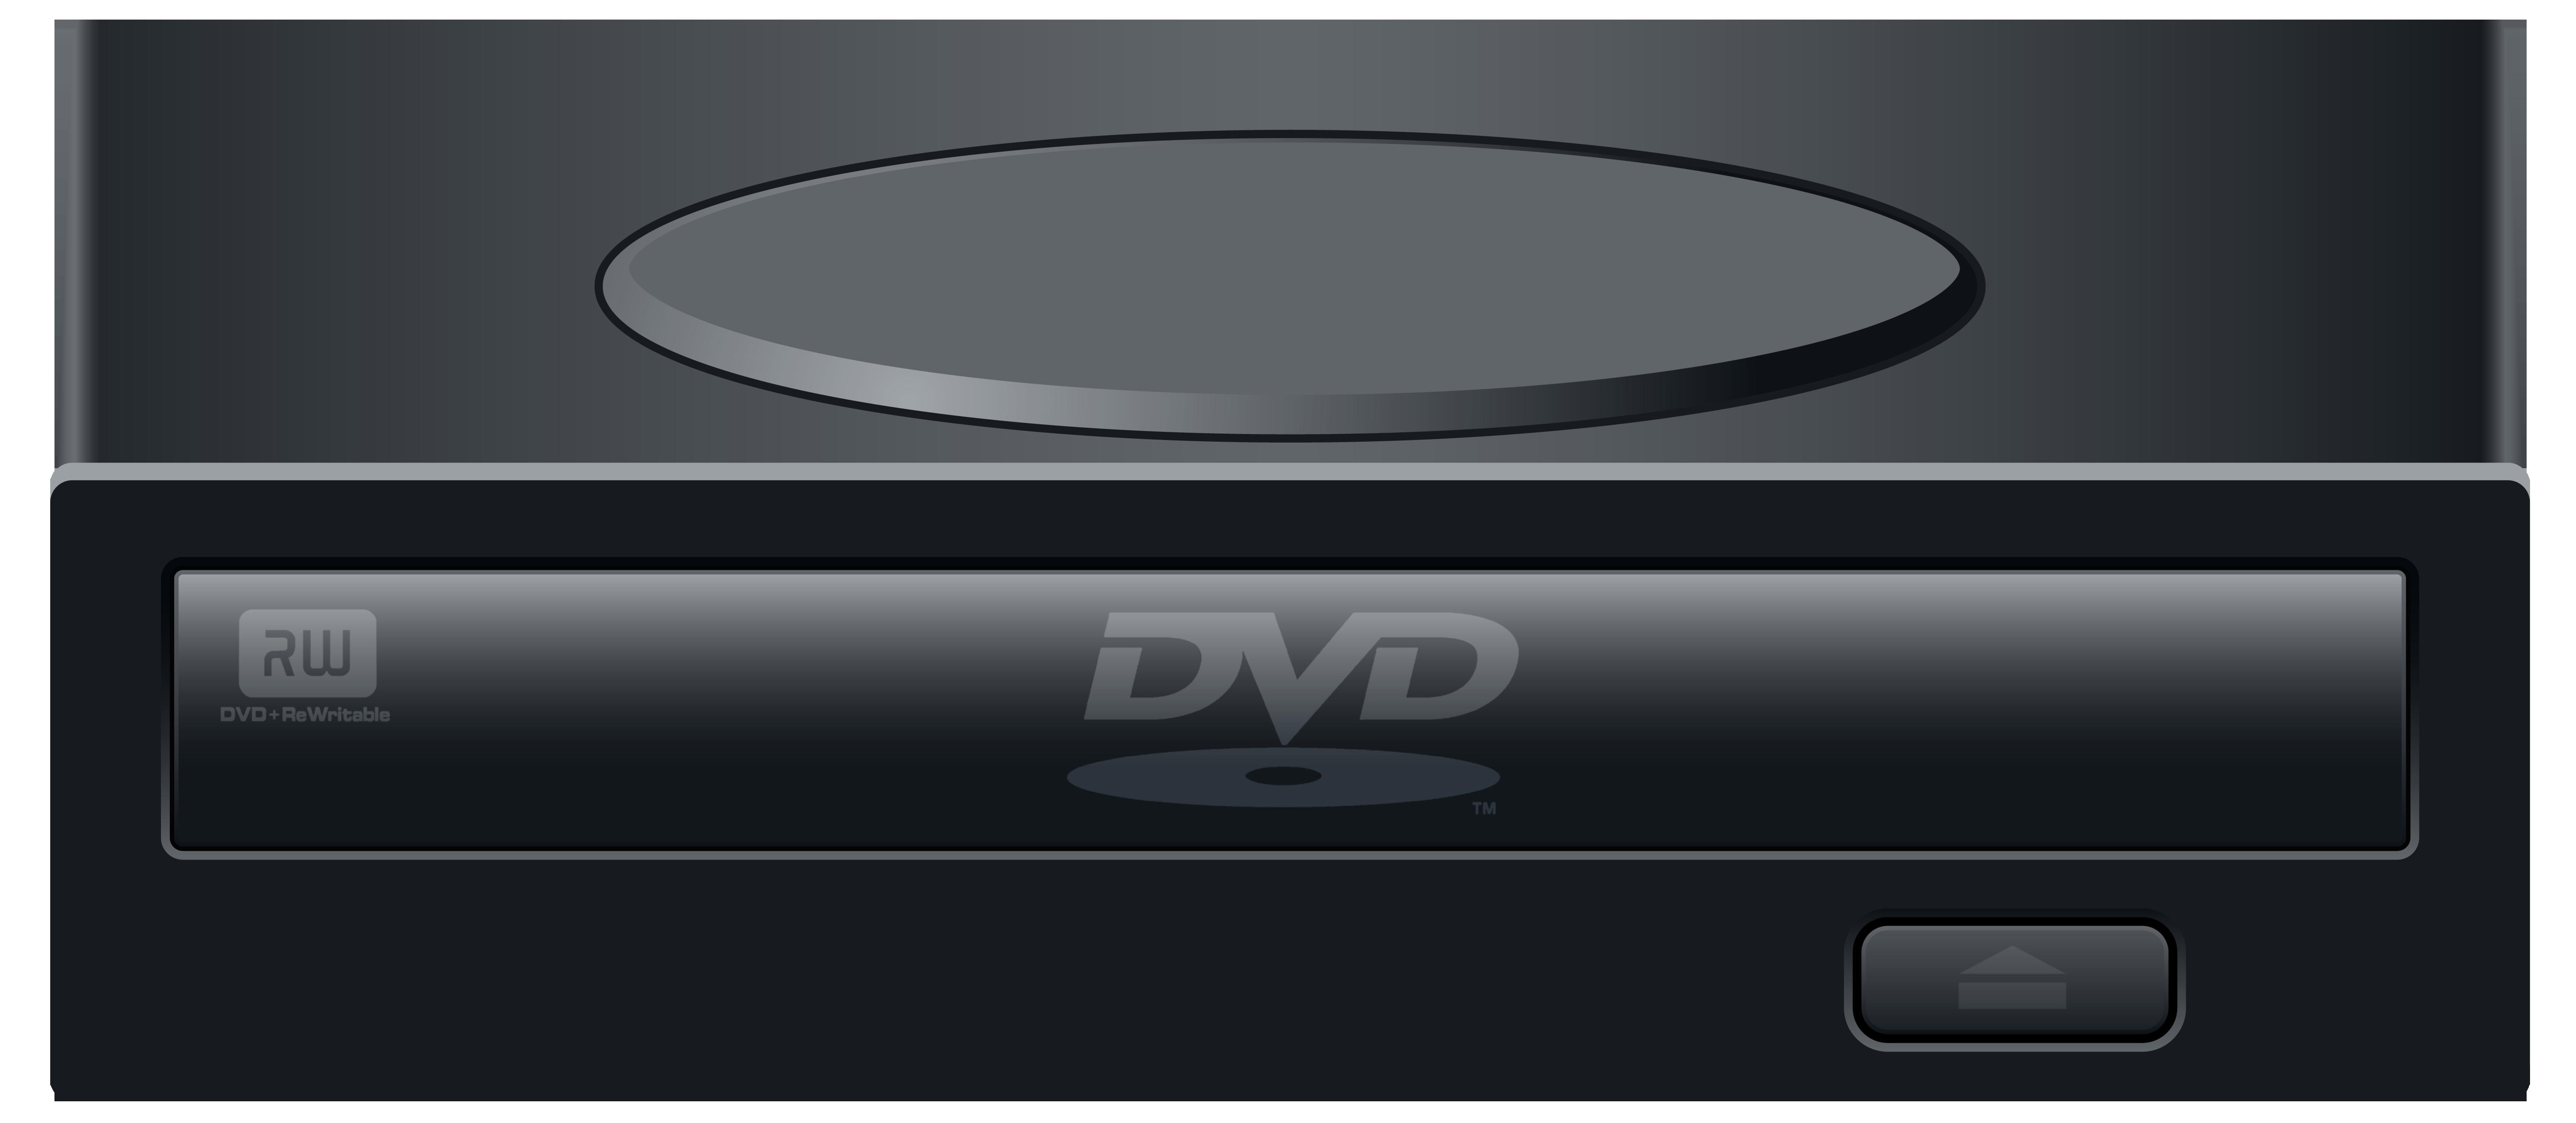 Black External DVD ROM Drive PNG Clipart.